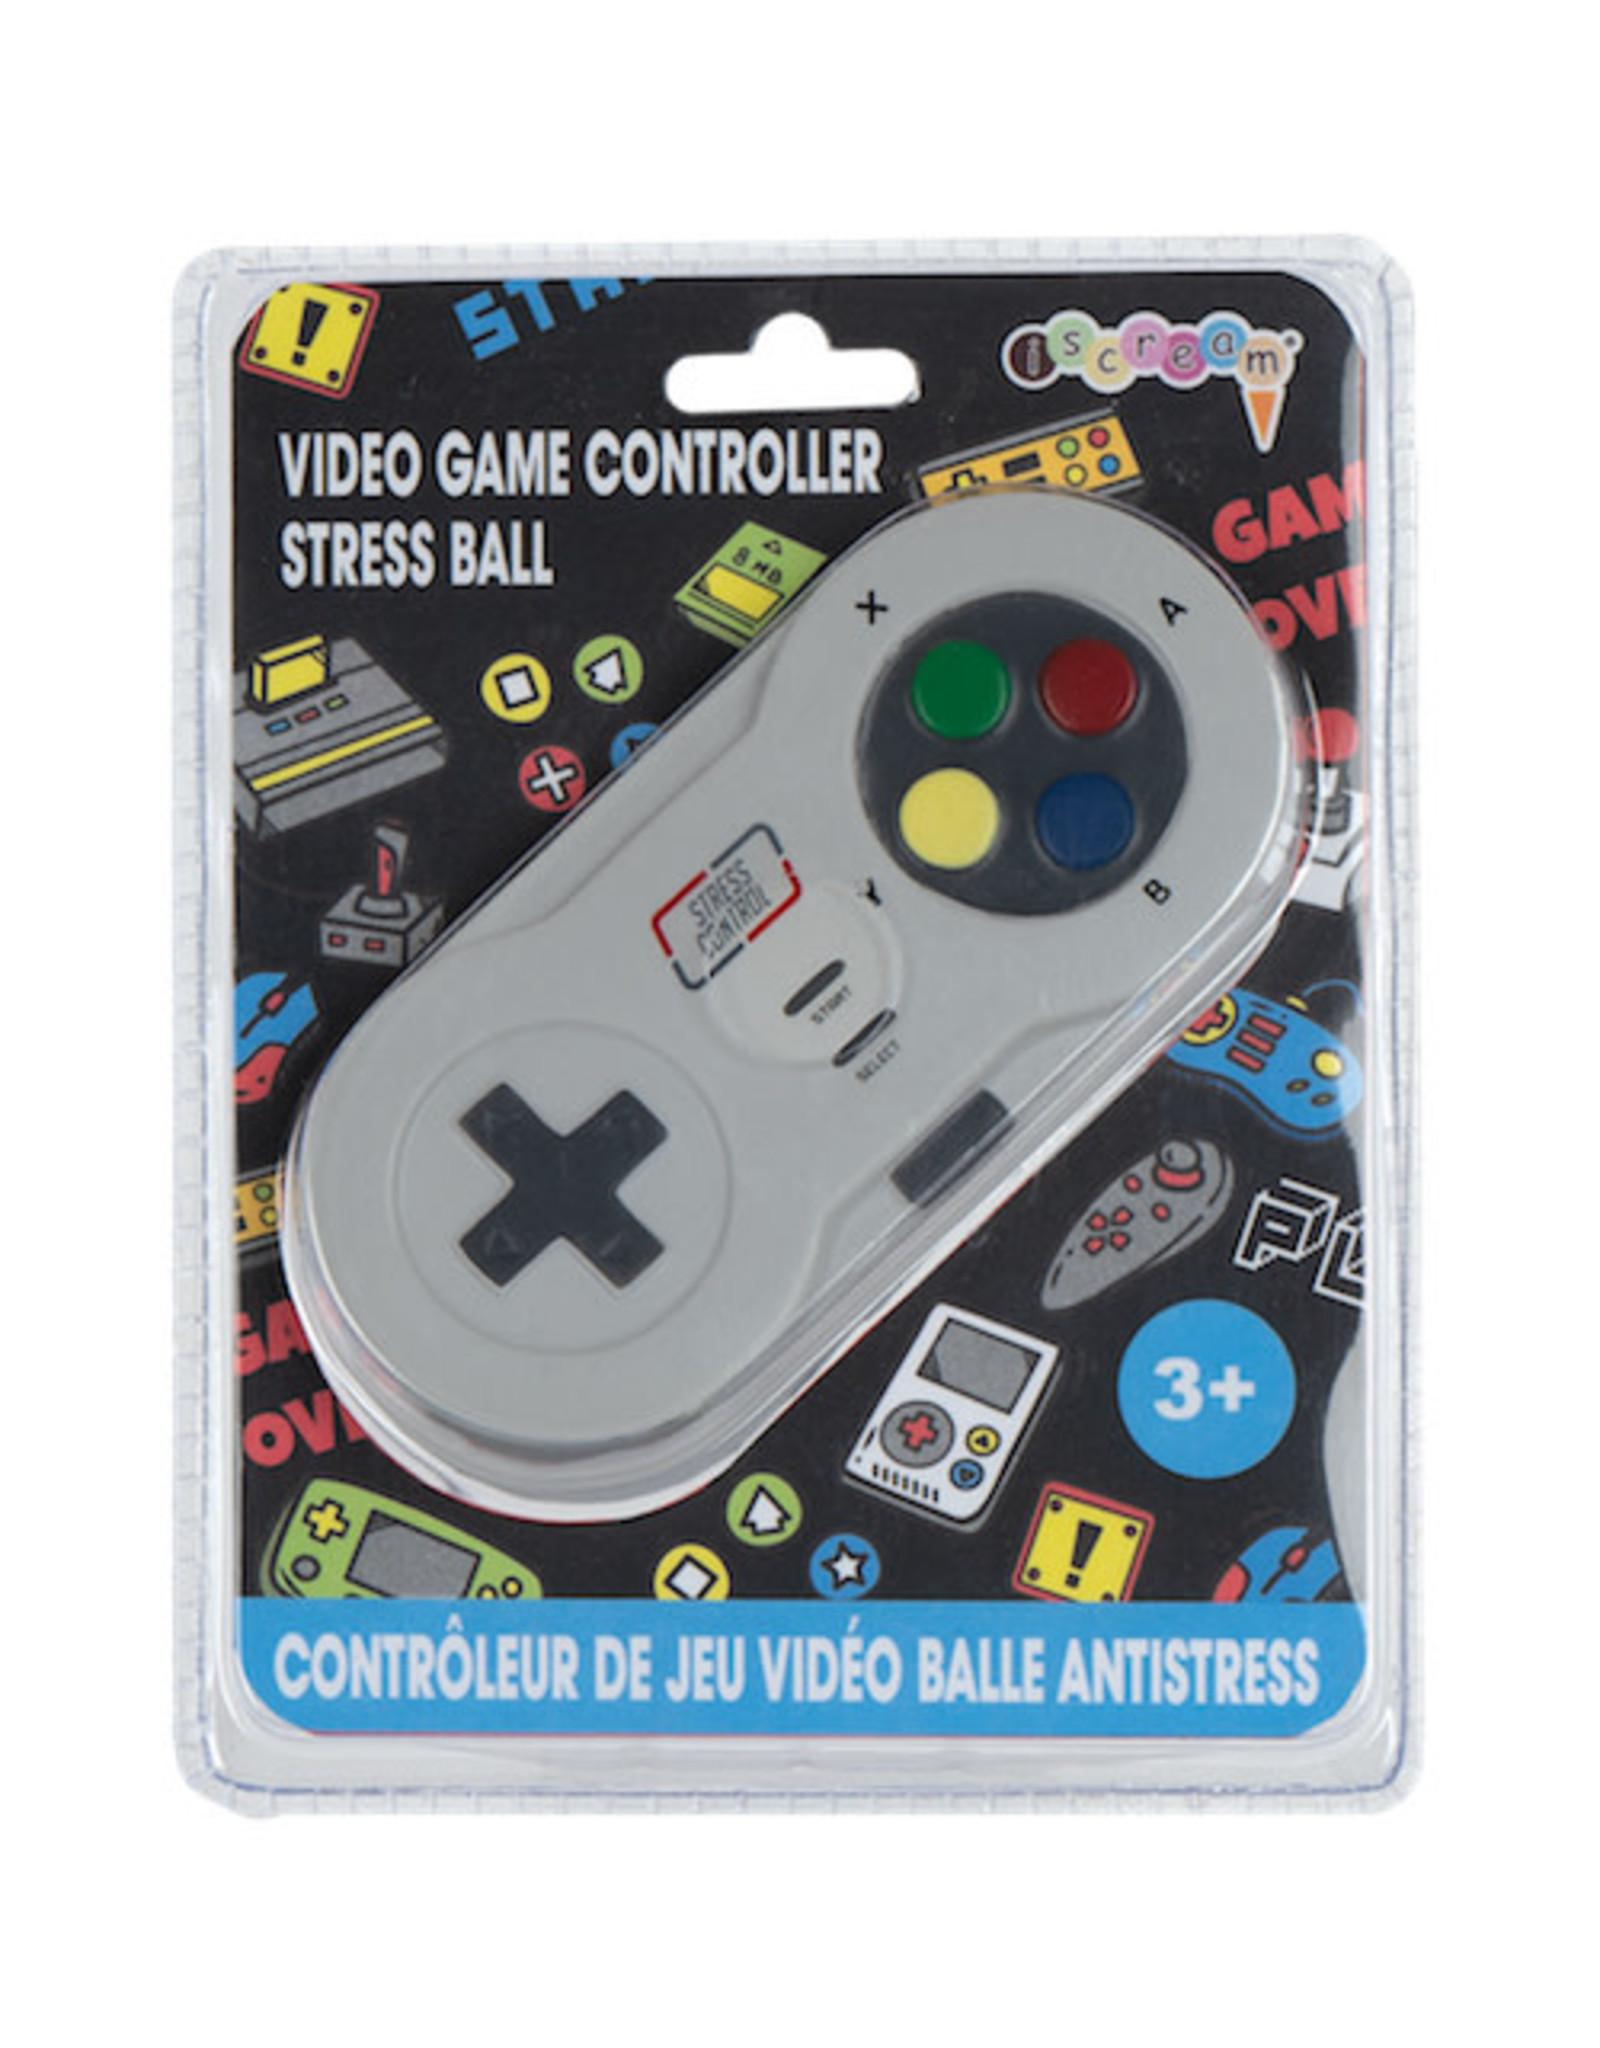 Iscream Retro Arcade Game Stress Ball